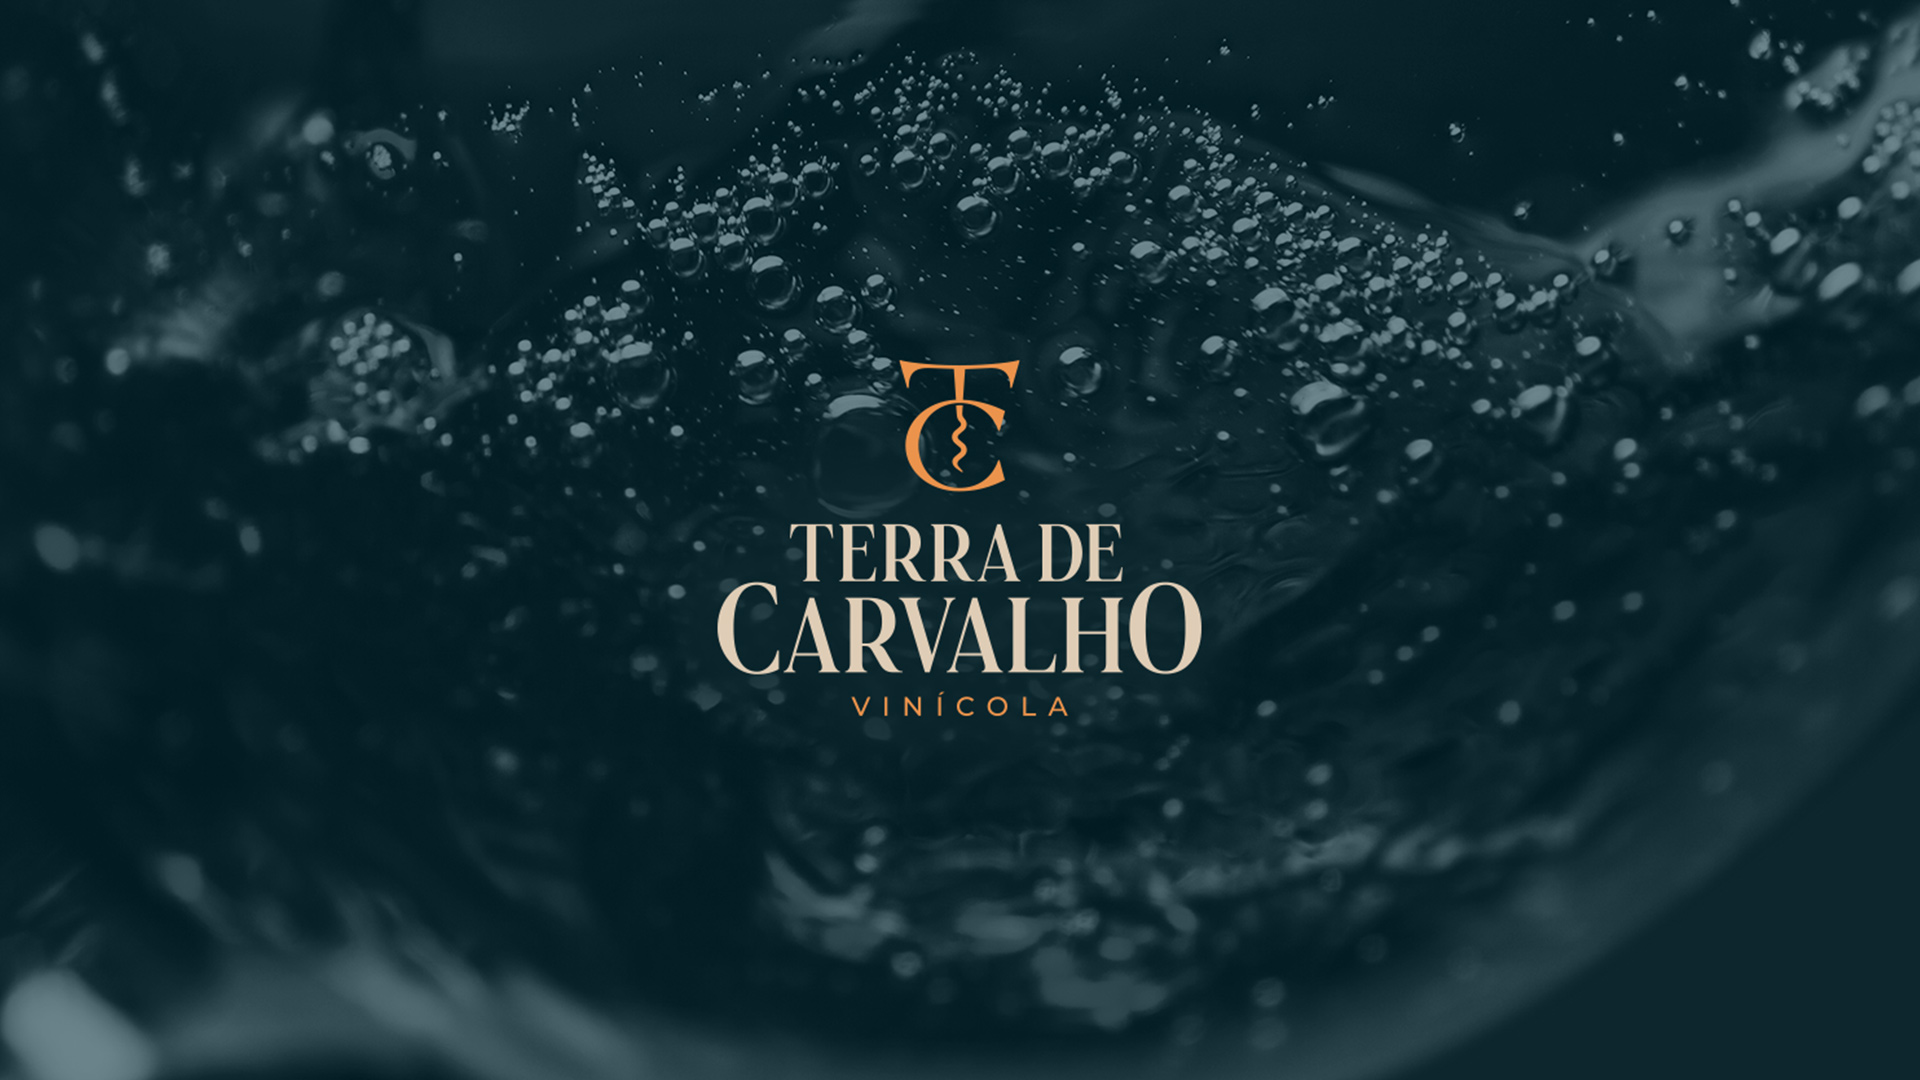 Brand Identity for Terra de Carvalho Winery by Lucas Coradi